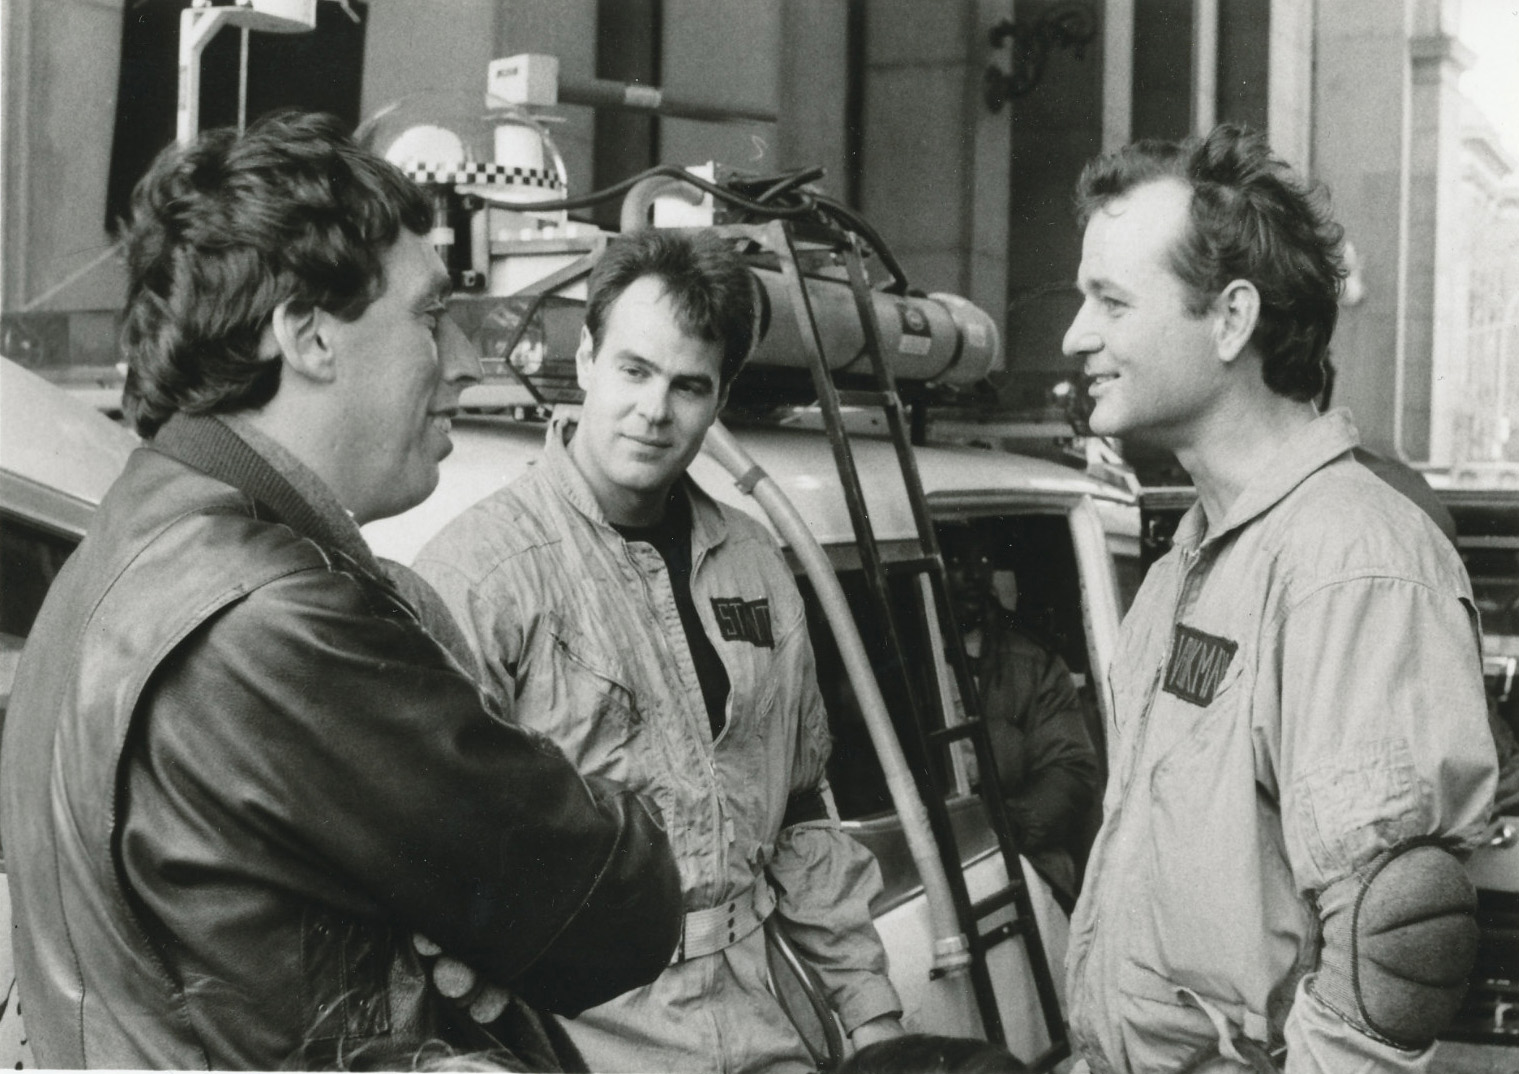 Producer/director Ivan Reitman talks with Dan Aykroyd and Bill Murray on set.